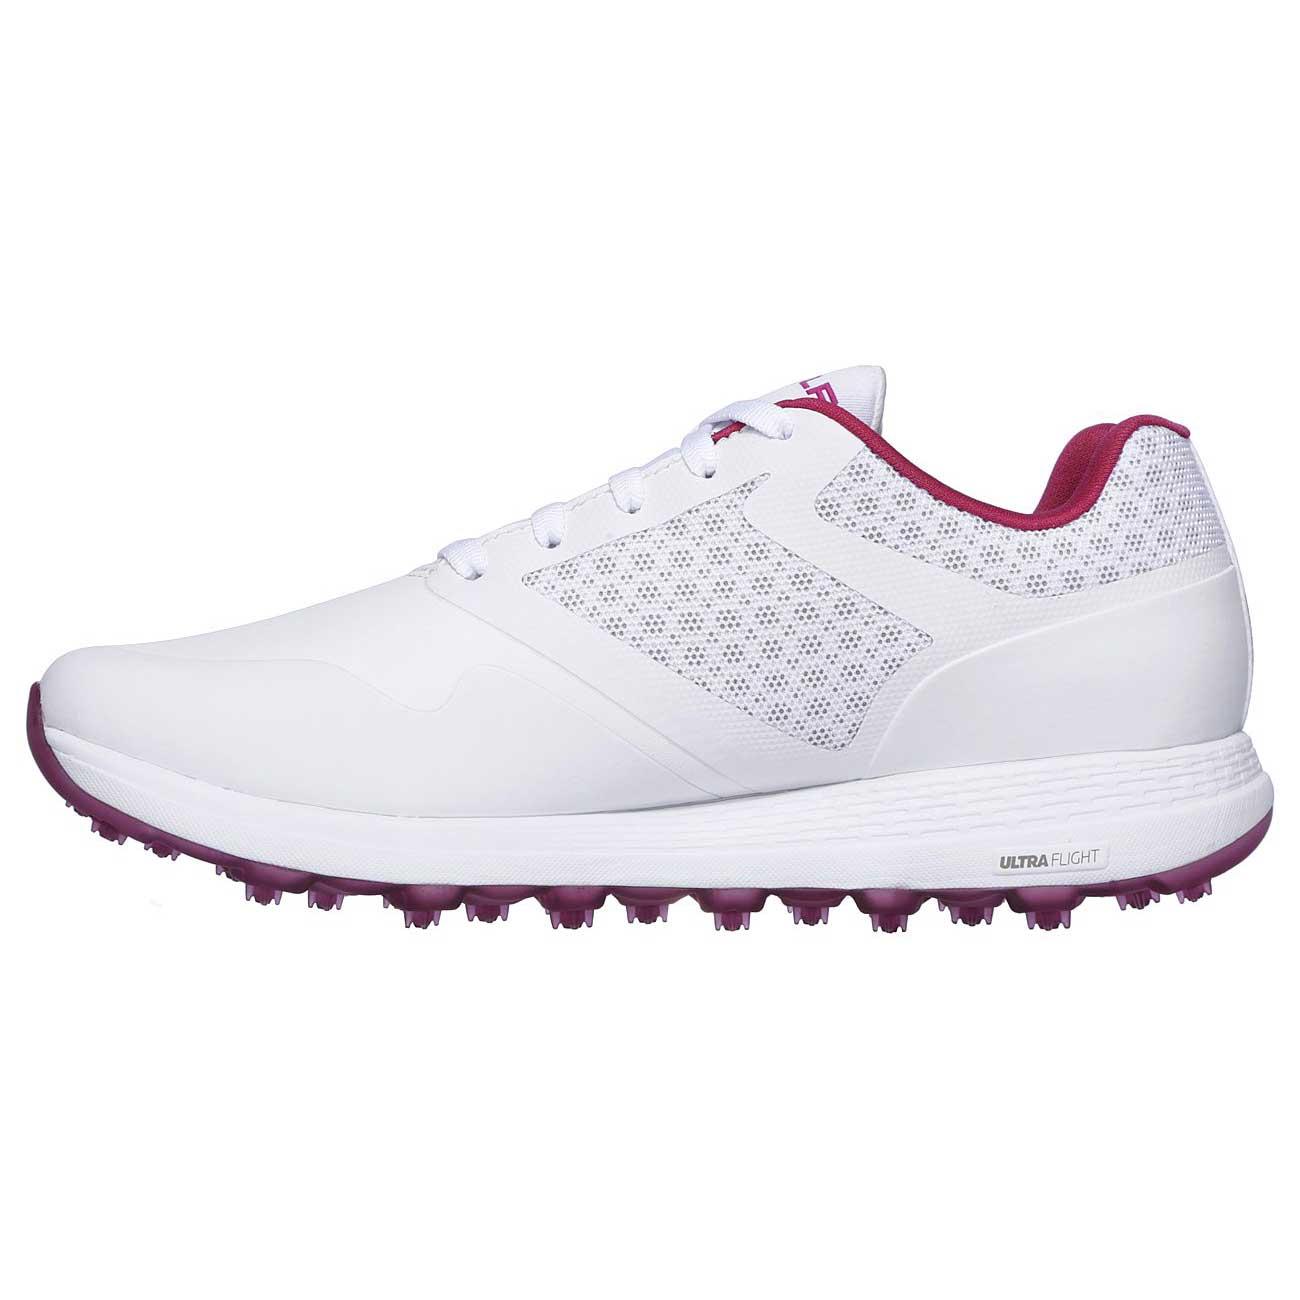 Skechers Women's Go Golf Max White/Pink Golf Shoe